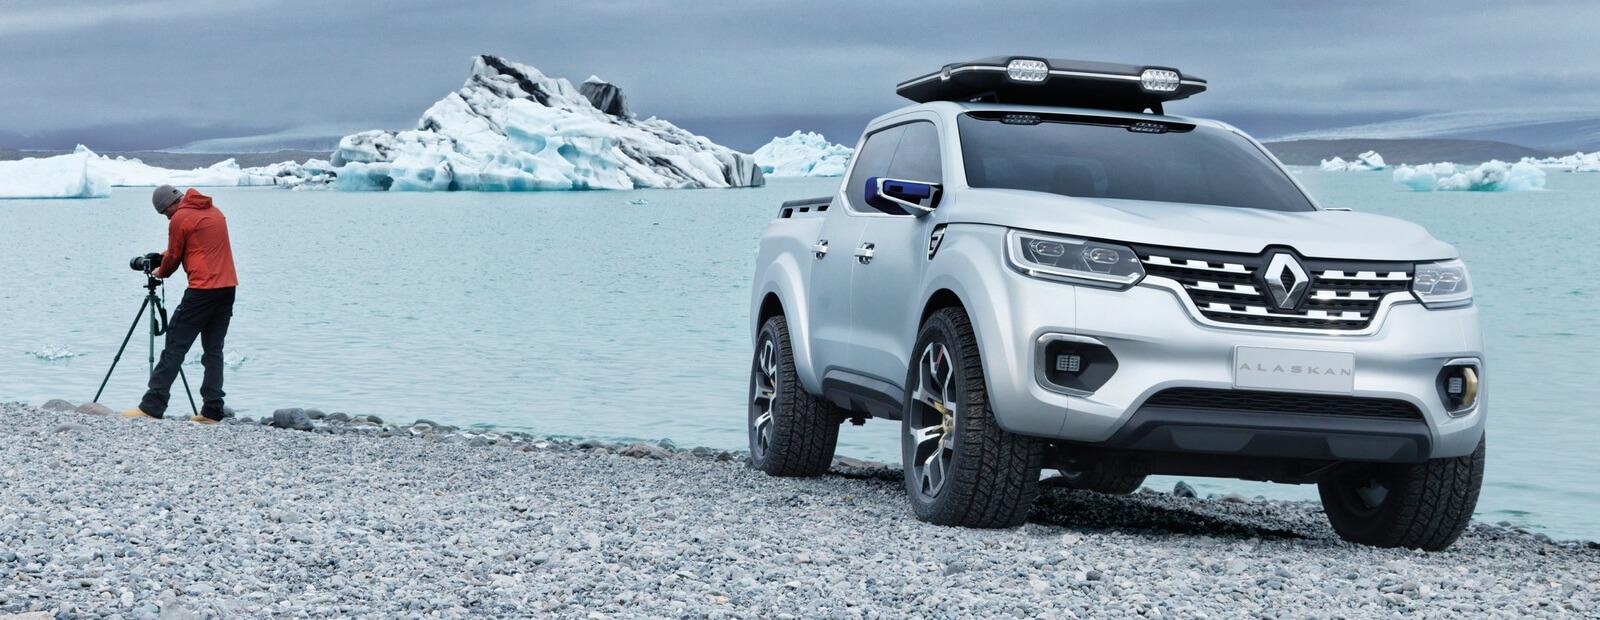 Renault Alaska